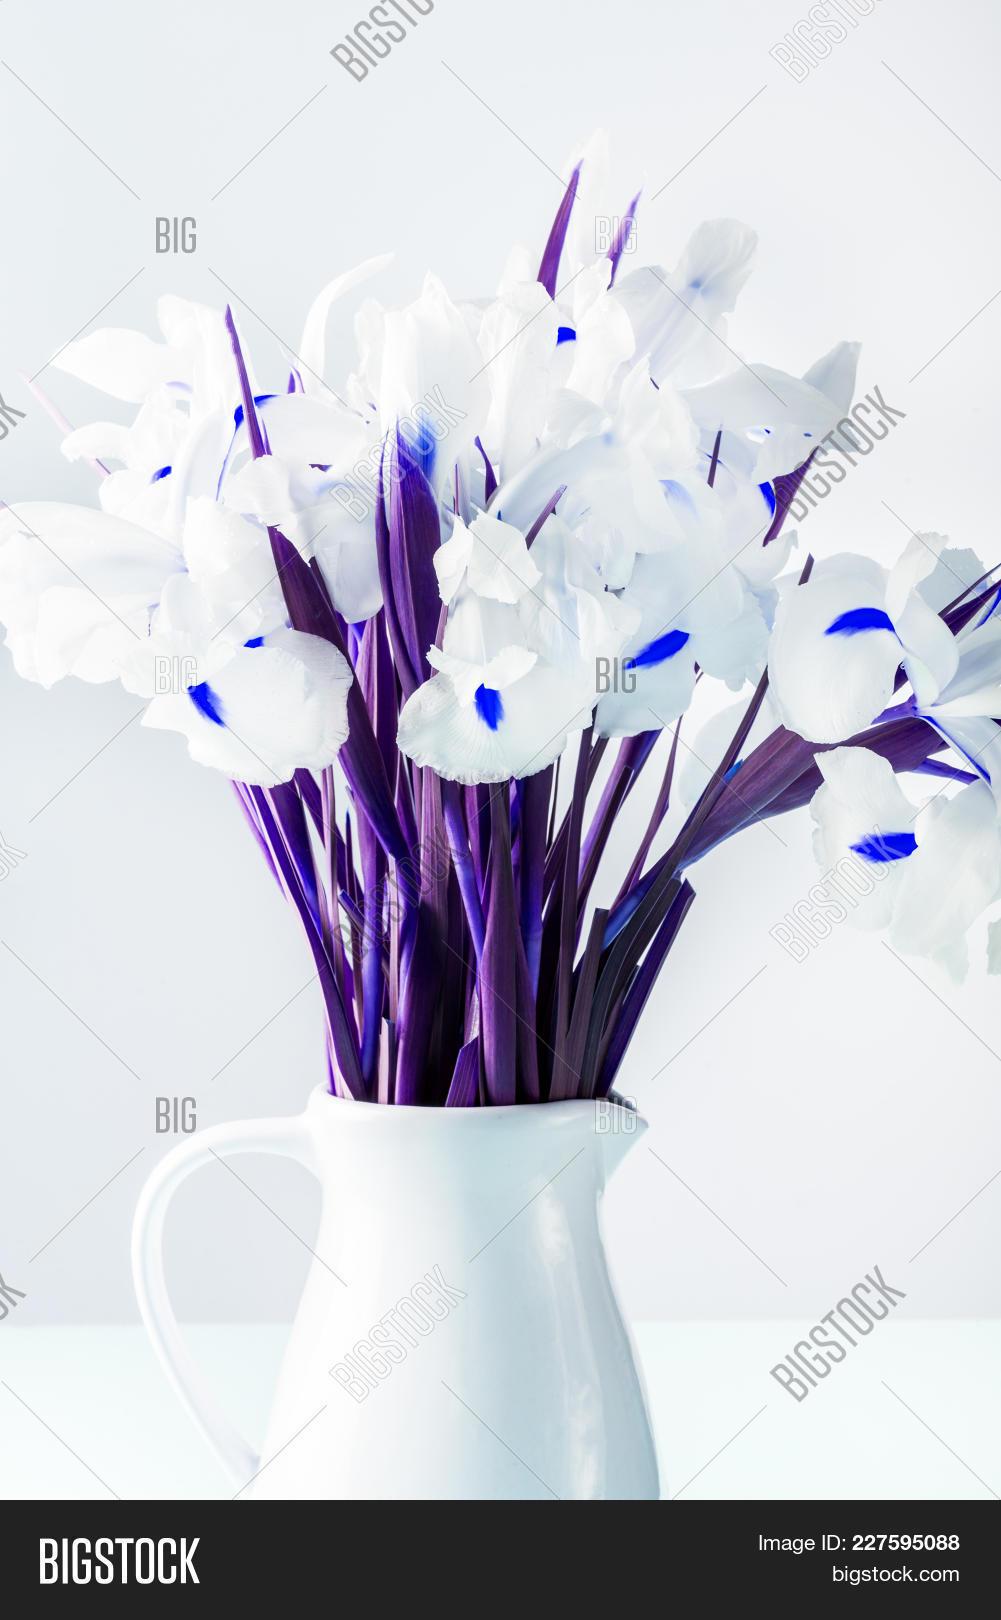 Beautiful white iris image photo free trial bigstock beautiful white iris flowers in the vase minimal art saturated image izmirmasajfo